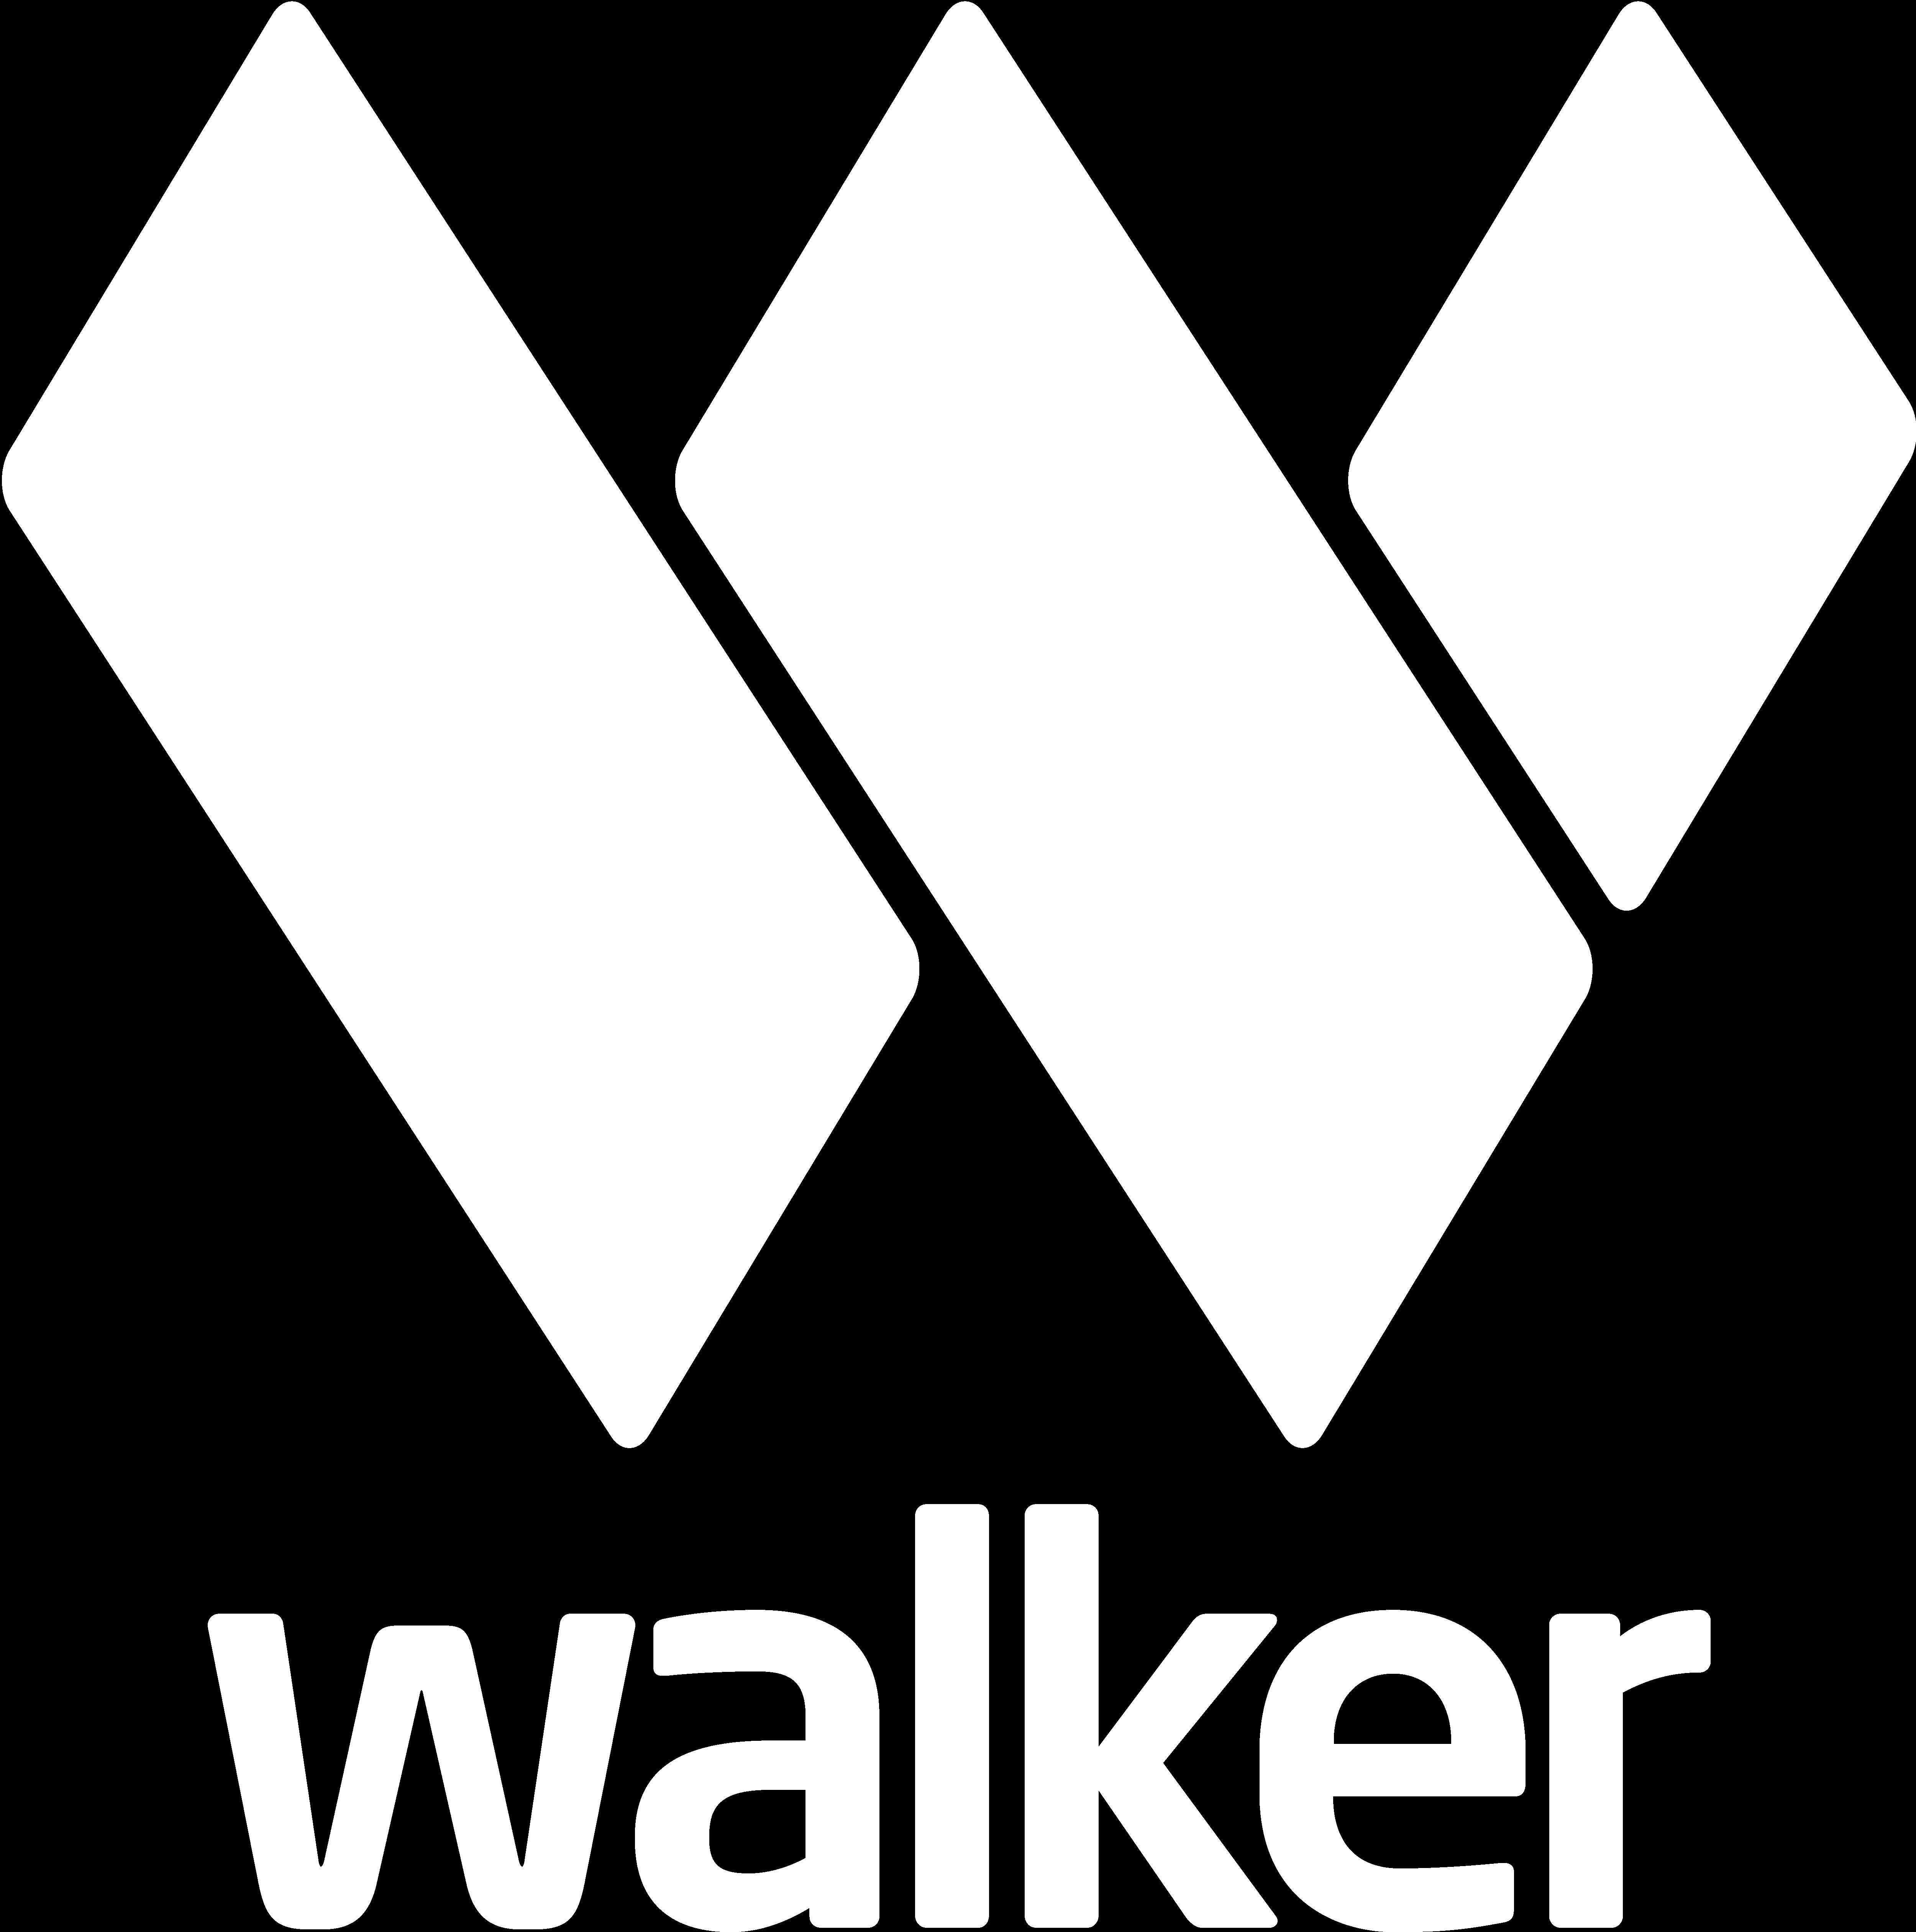 https://maroochy.org/wp-content/uploads/2021/04/Walker-Logo-White4.png